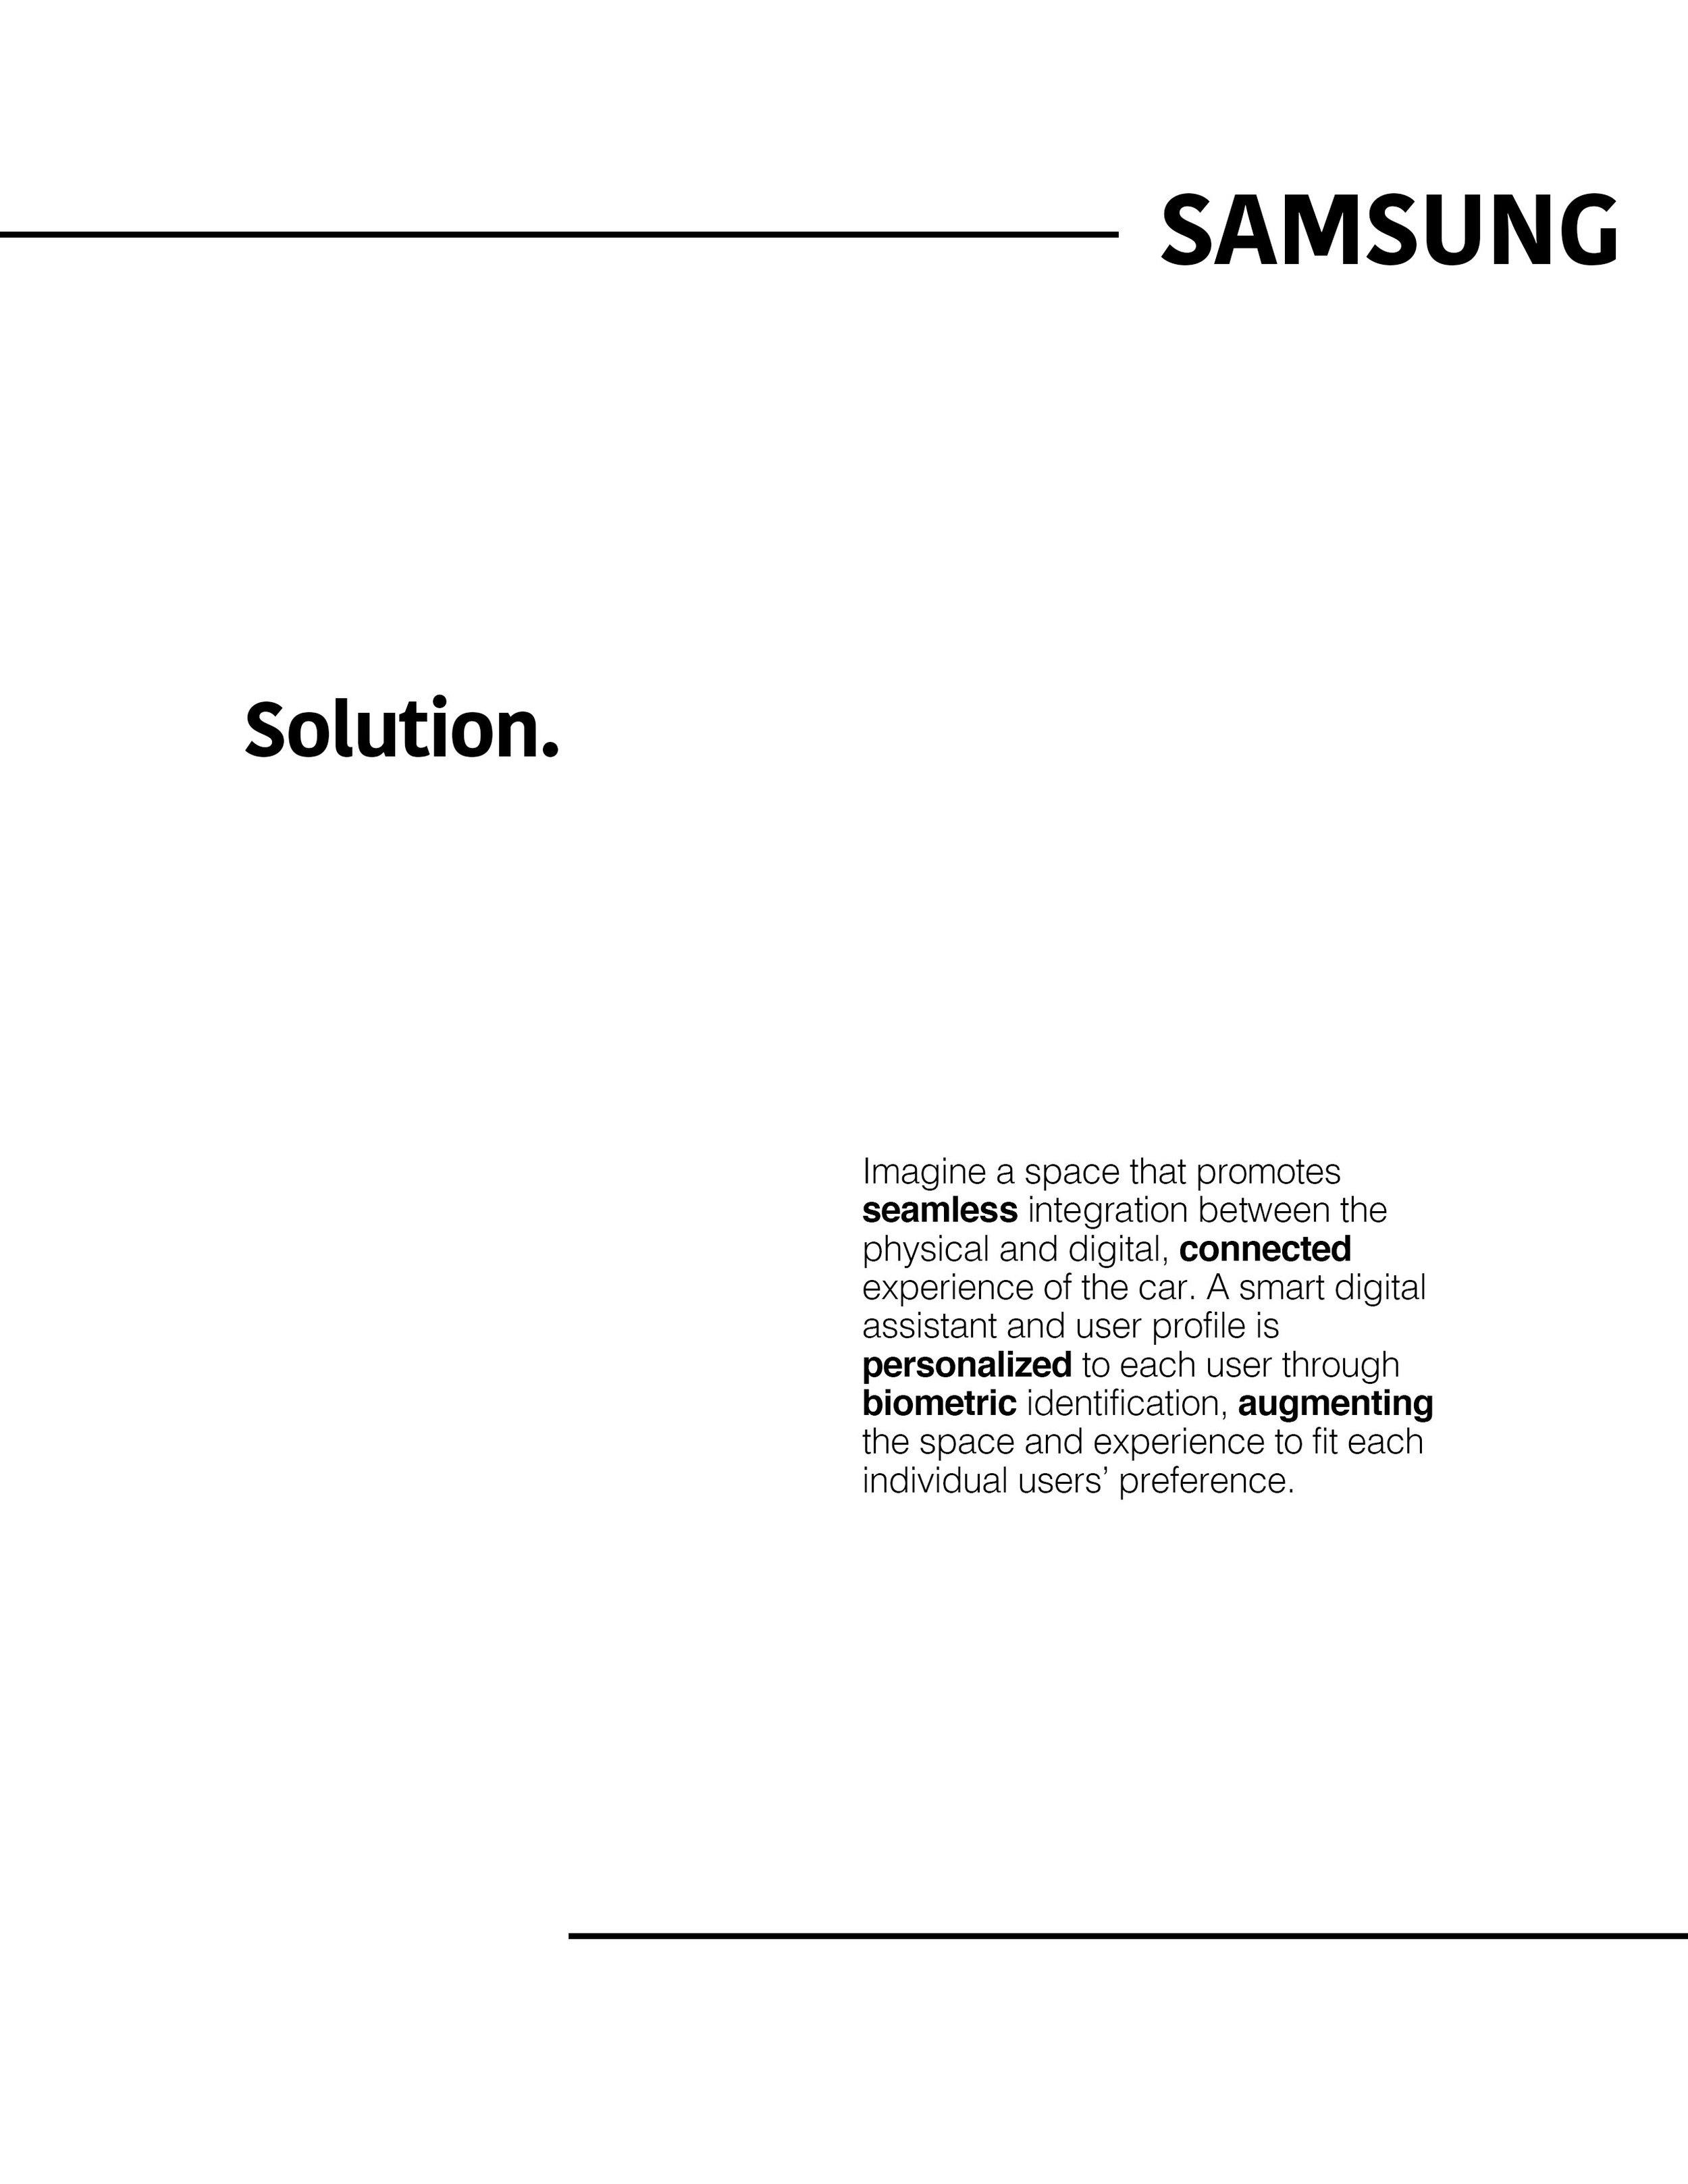 SamsungProjectArtboard 2 copy 2.jpg